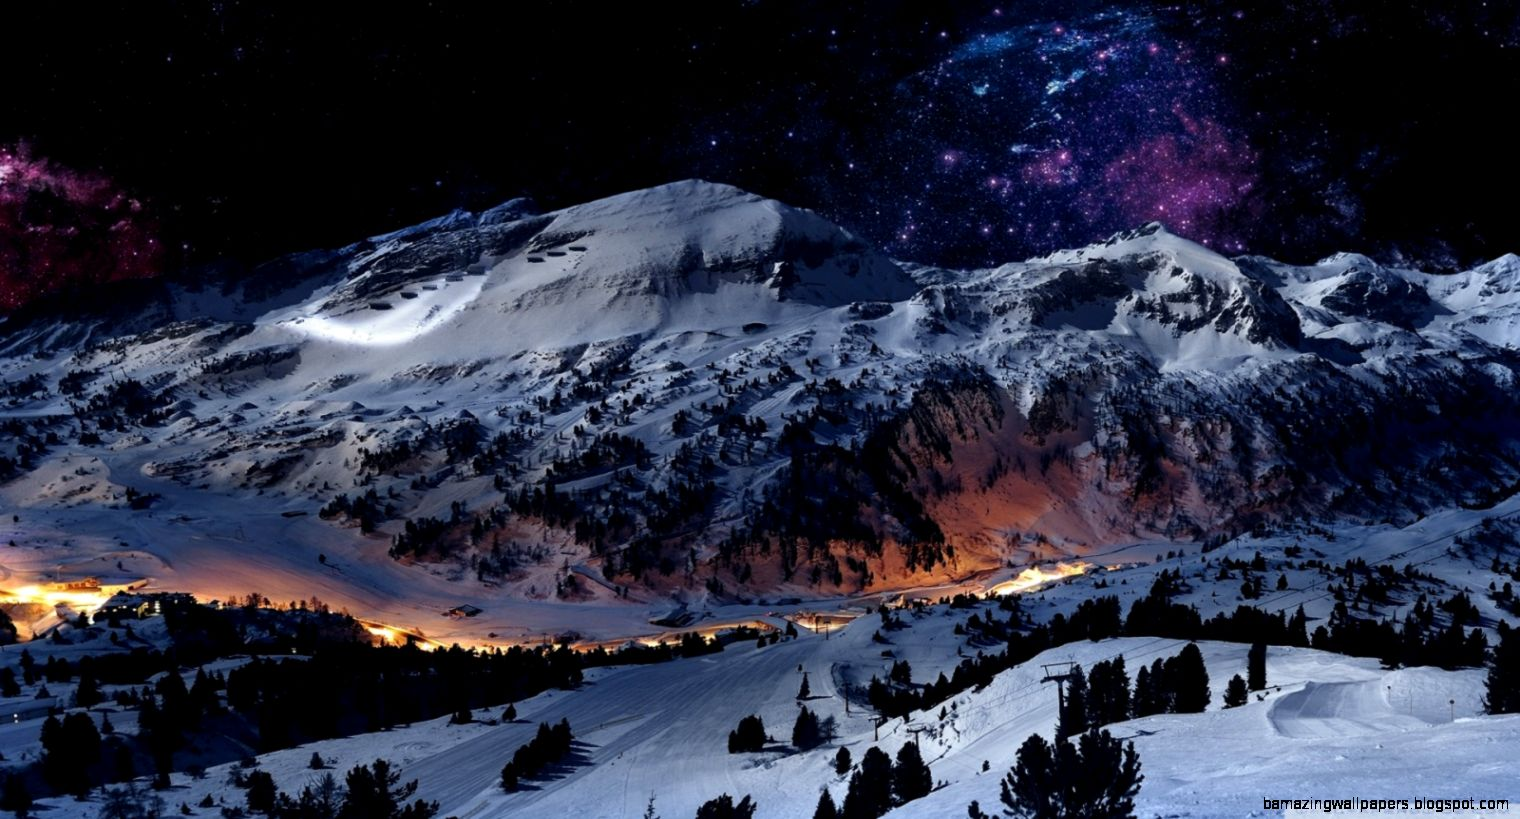 Winter Night Sky Wallpaper 1920x1080 Amazing Wallpapers